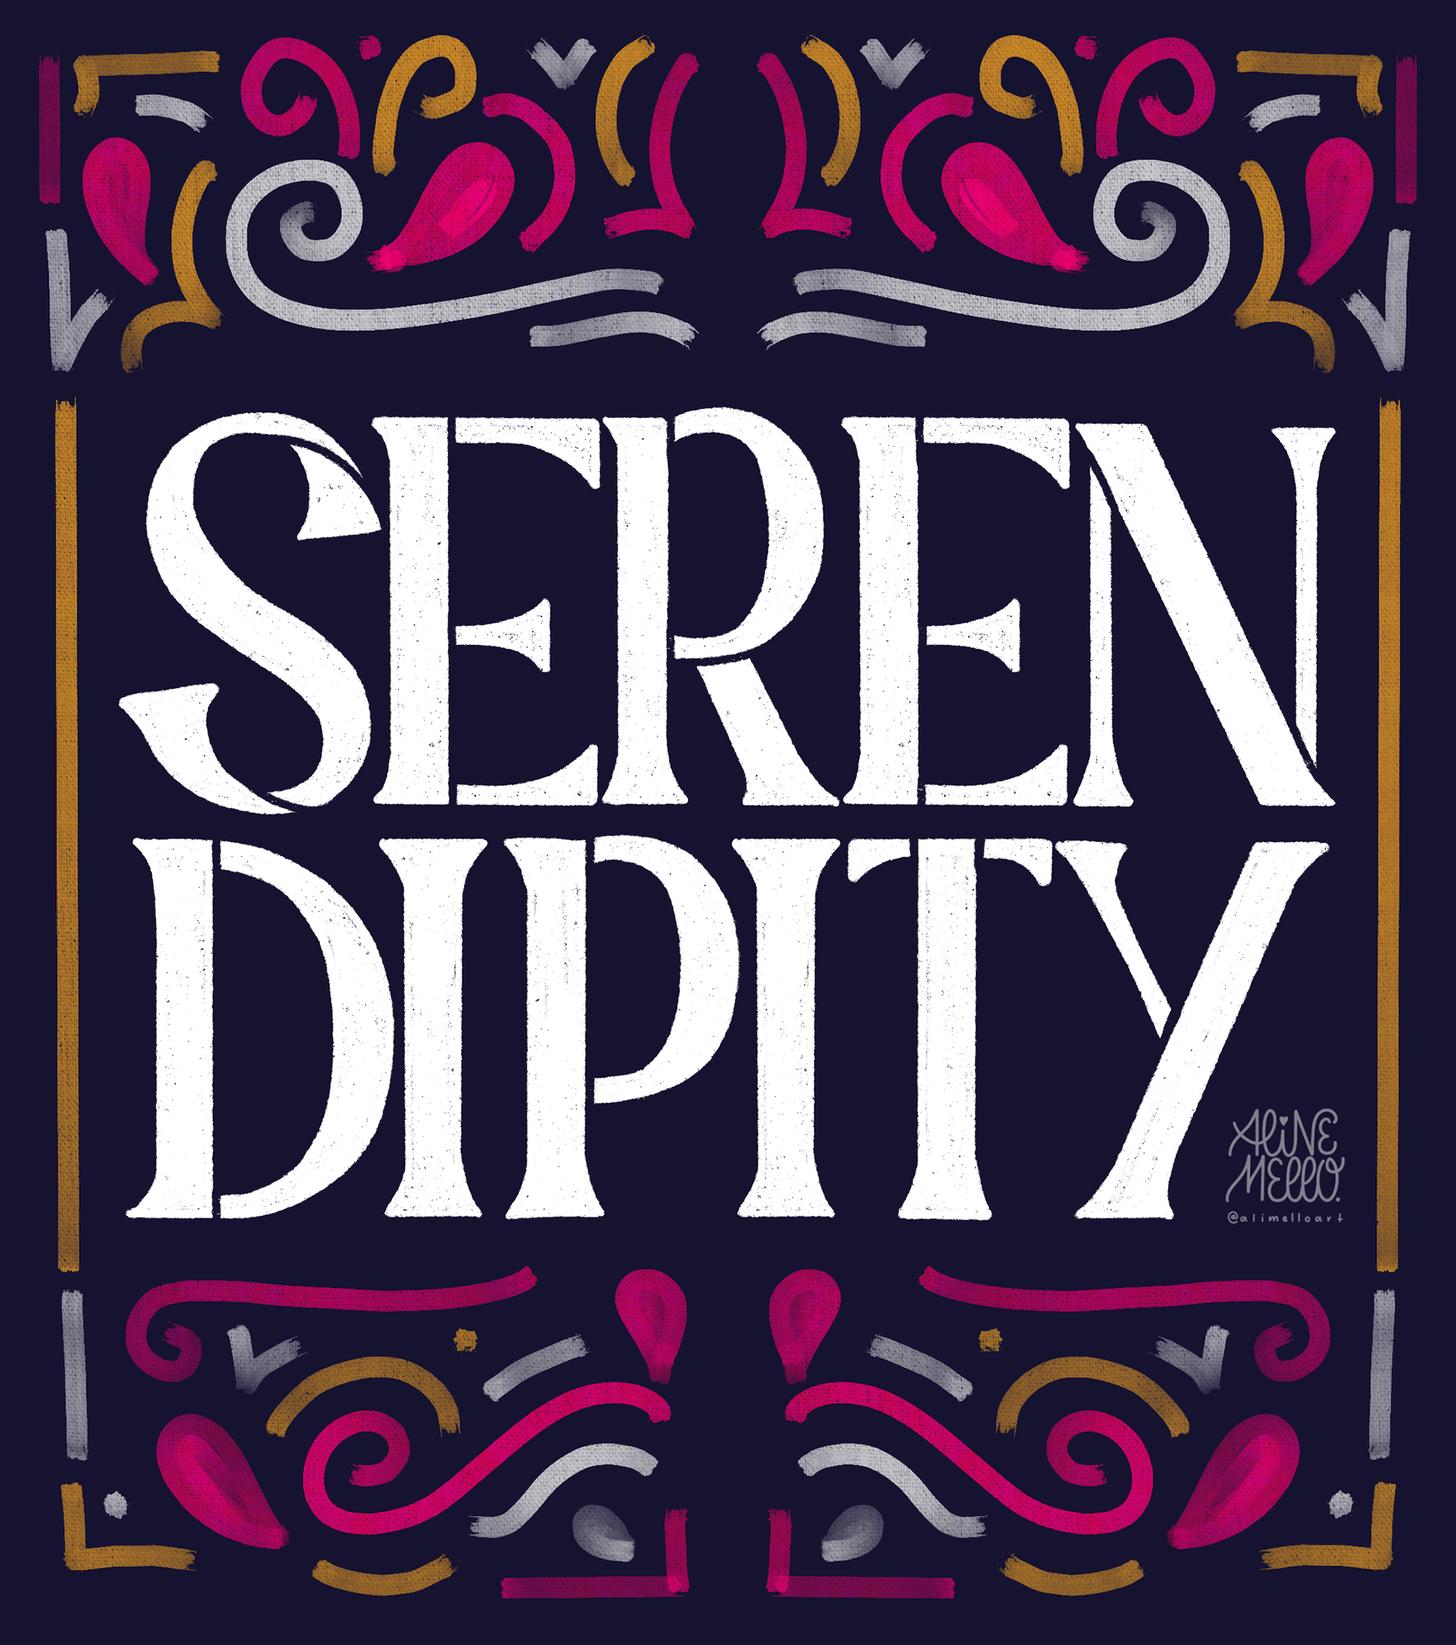 serendipity typography image